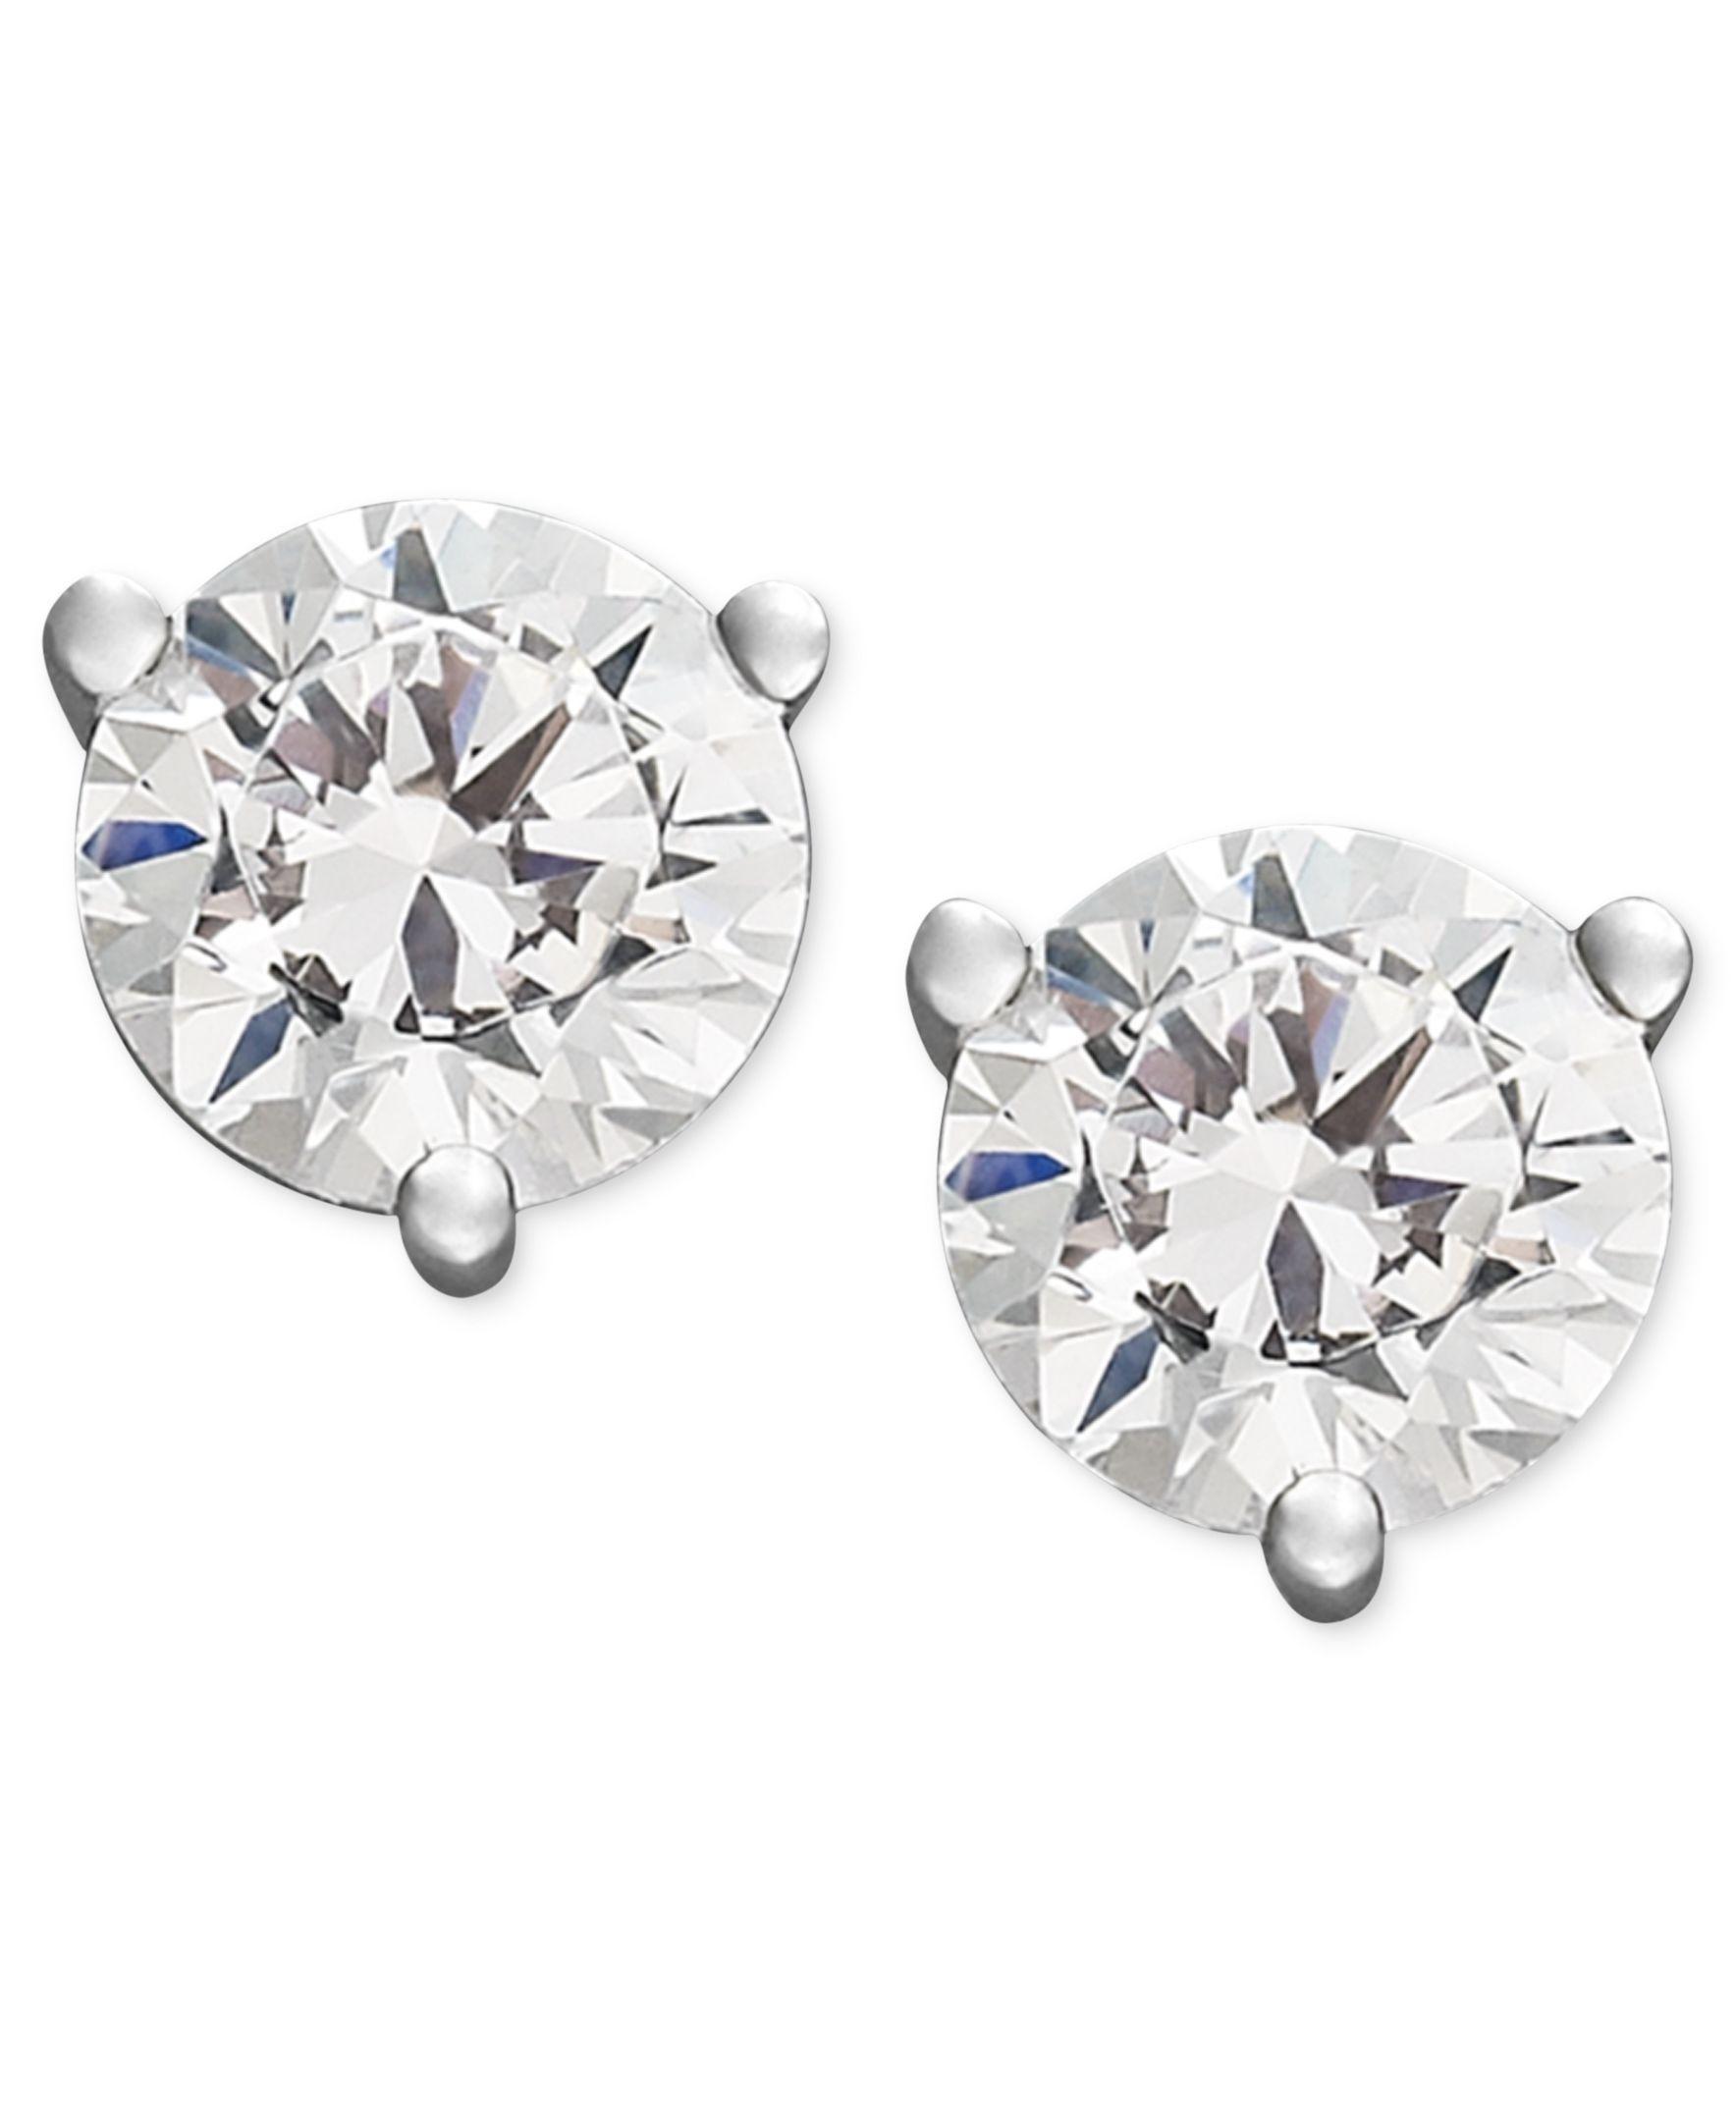 Certified Near Colorless Diamond Stud Earrings In 18k White Gold Or Gold 1 4 Ct T W Stud Earrings Bar Stud Earrings Diamond Studs